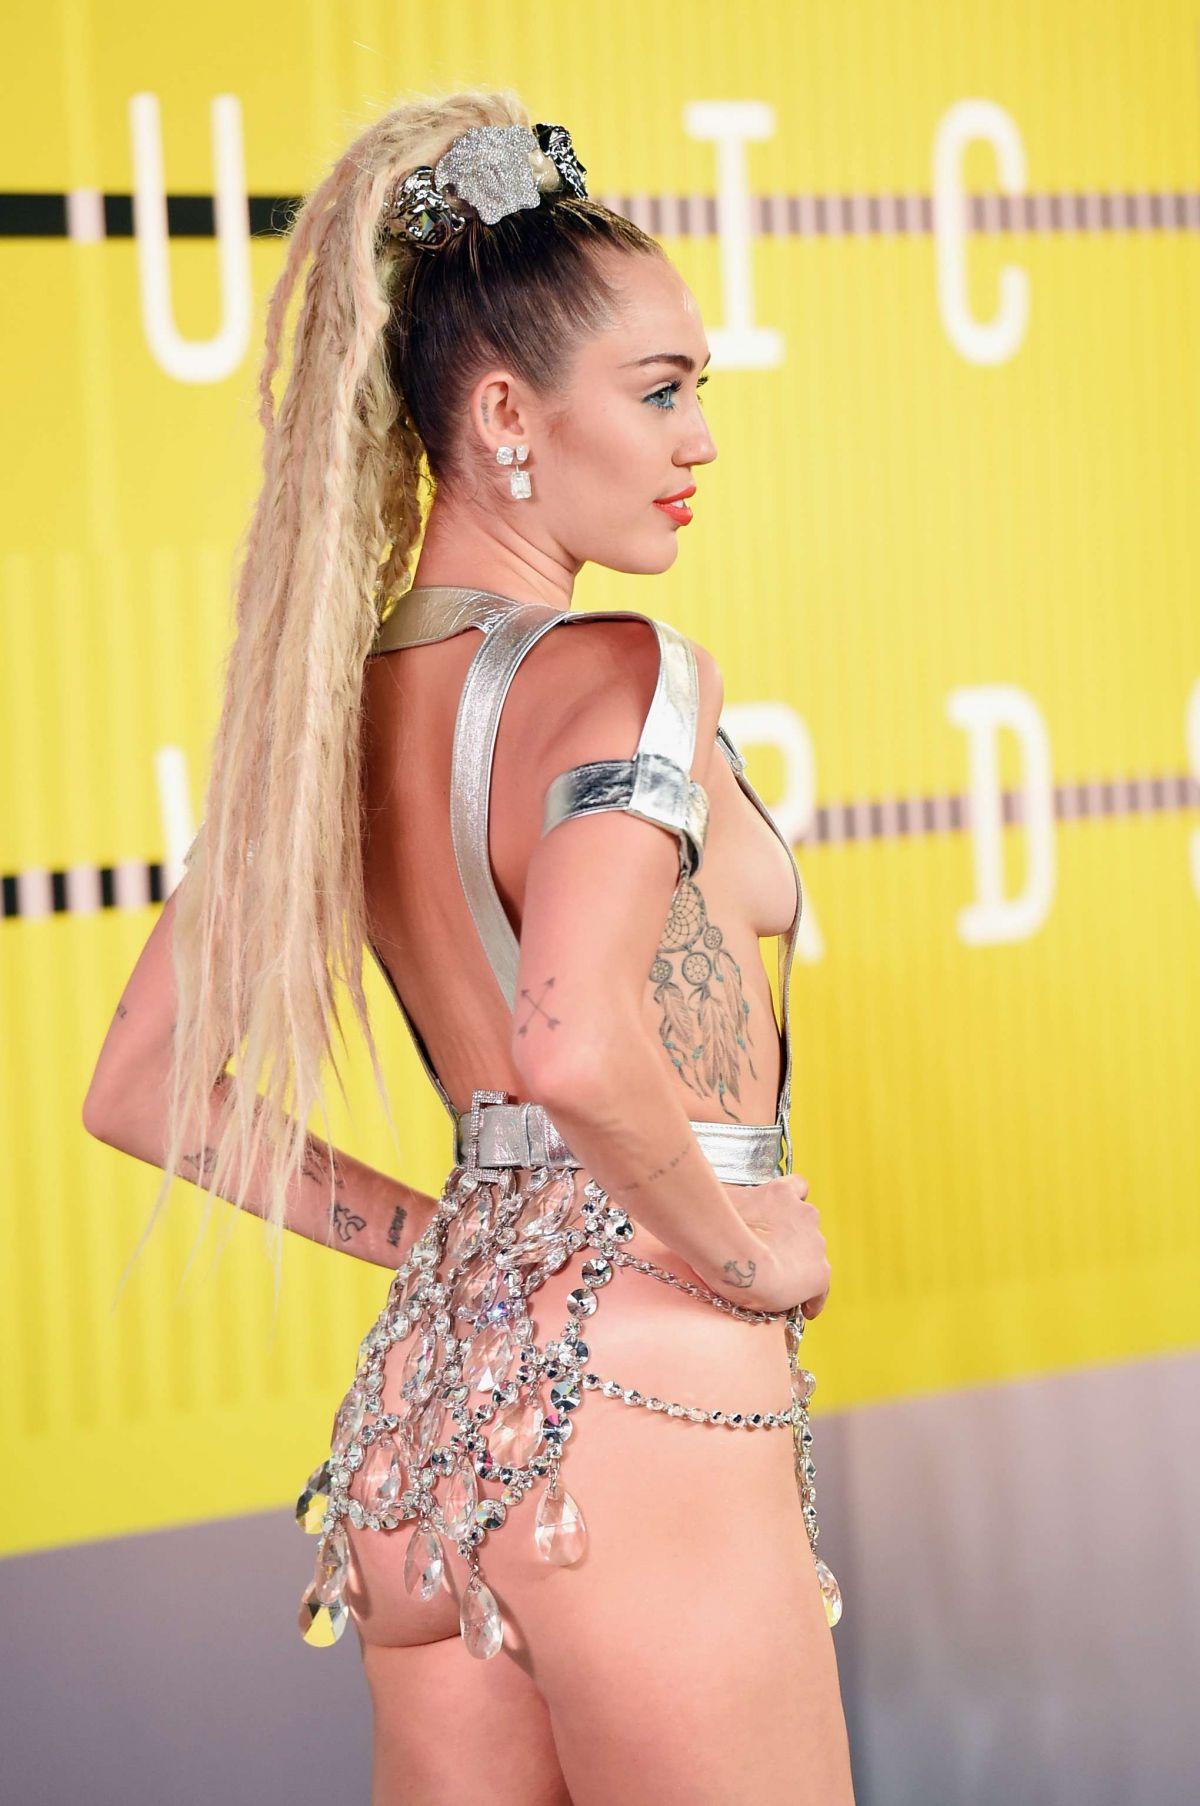 Miley cyrus los angeles 2014 concert highlights 4